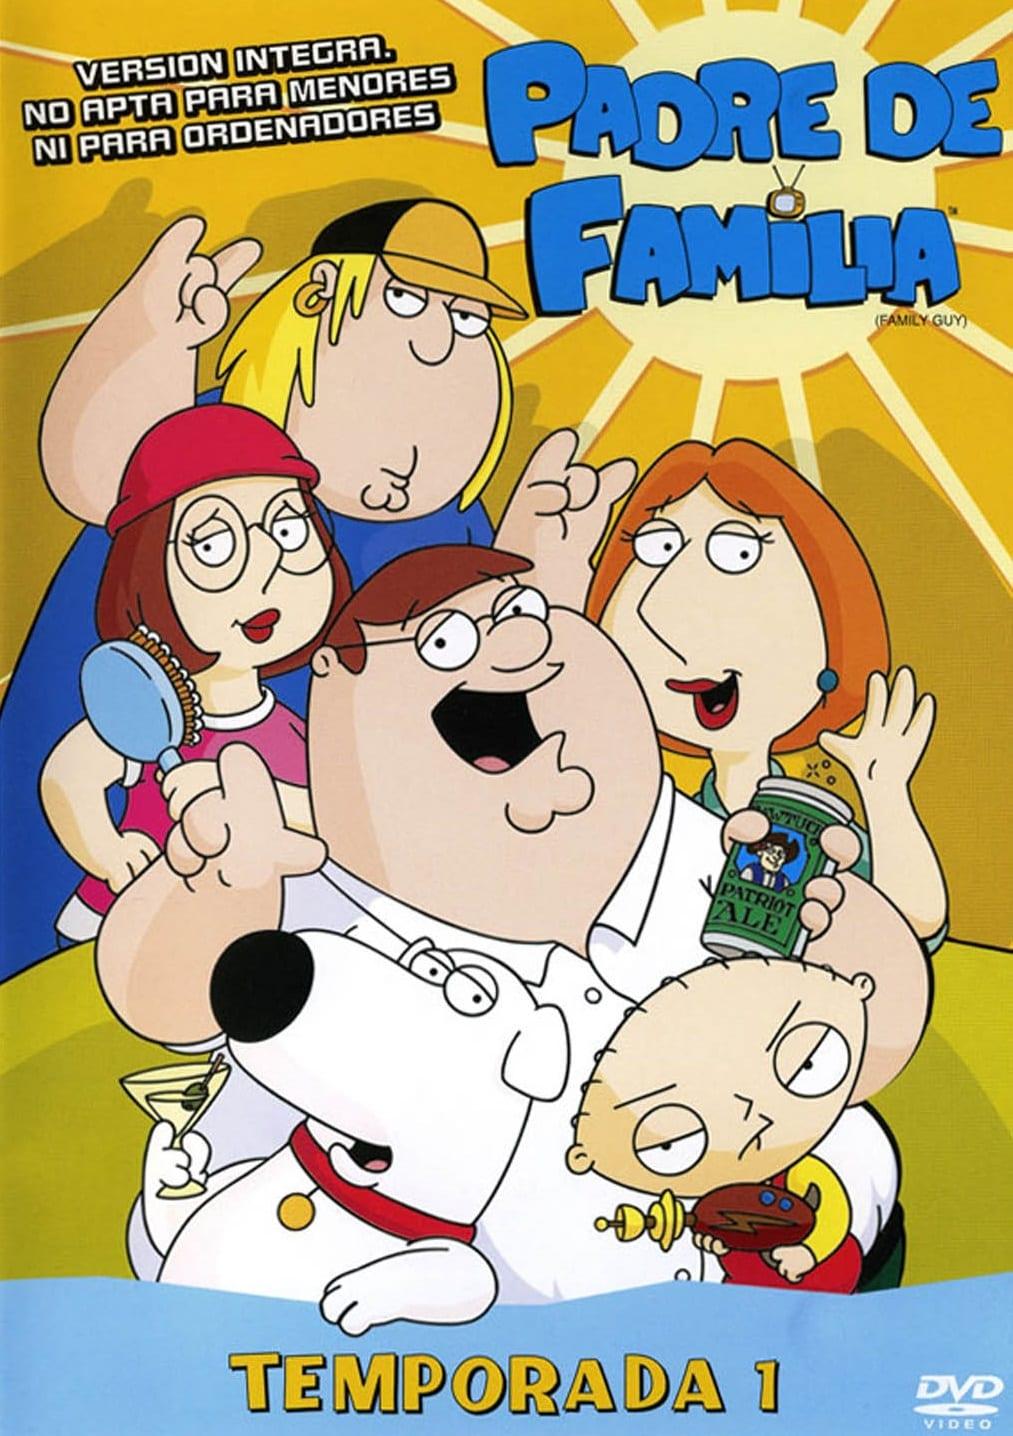 Crítica de serie: Padre de familia